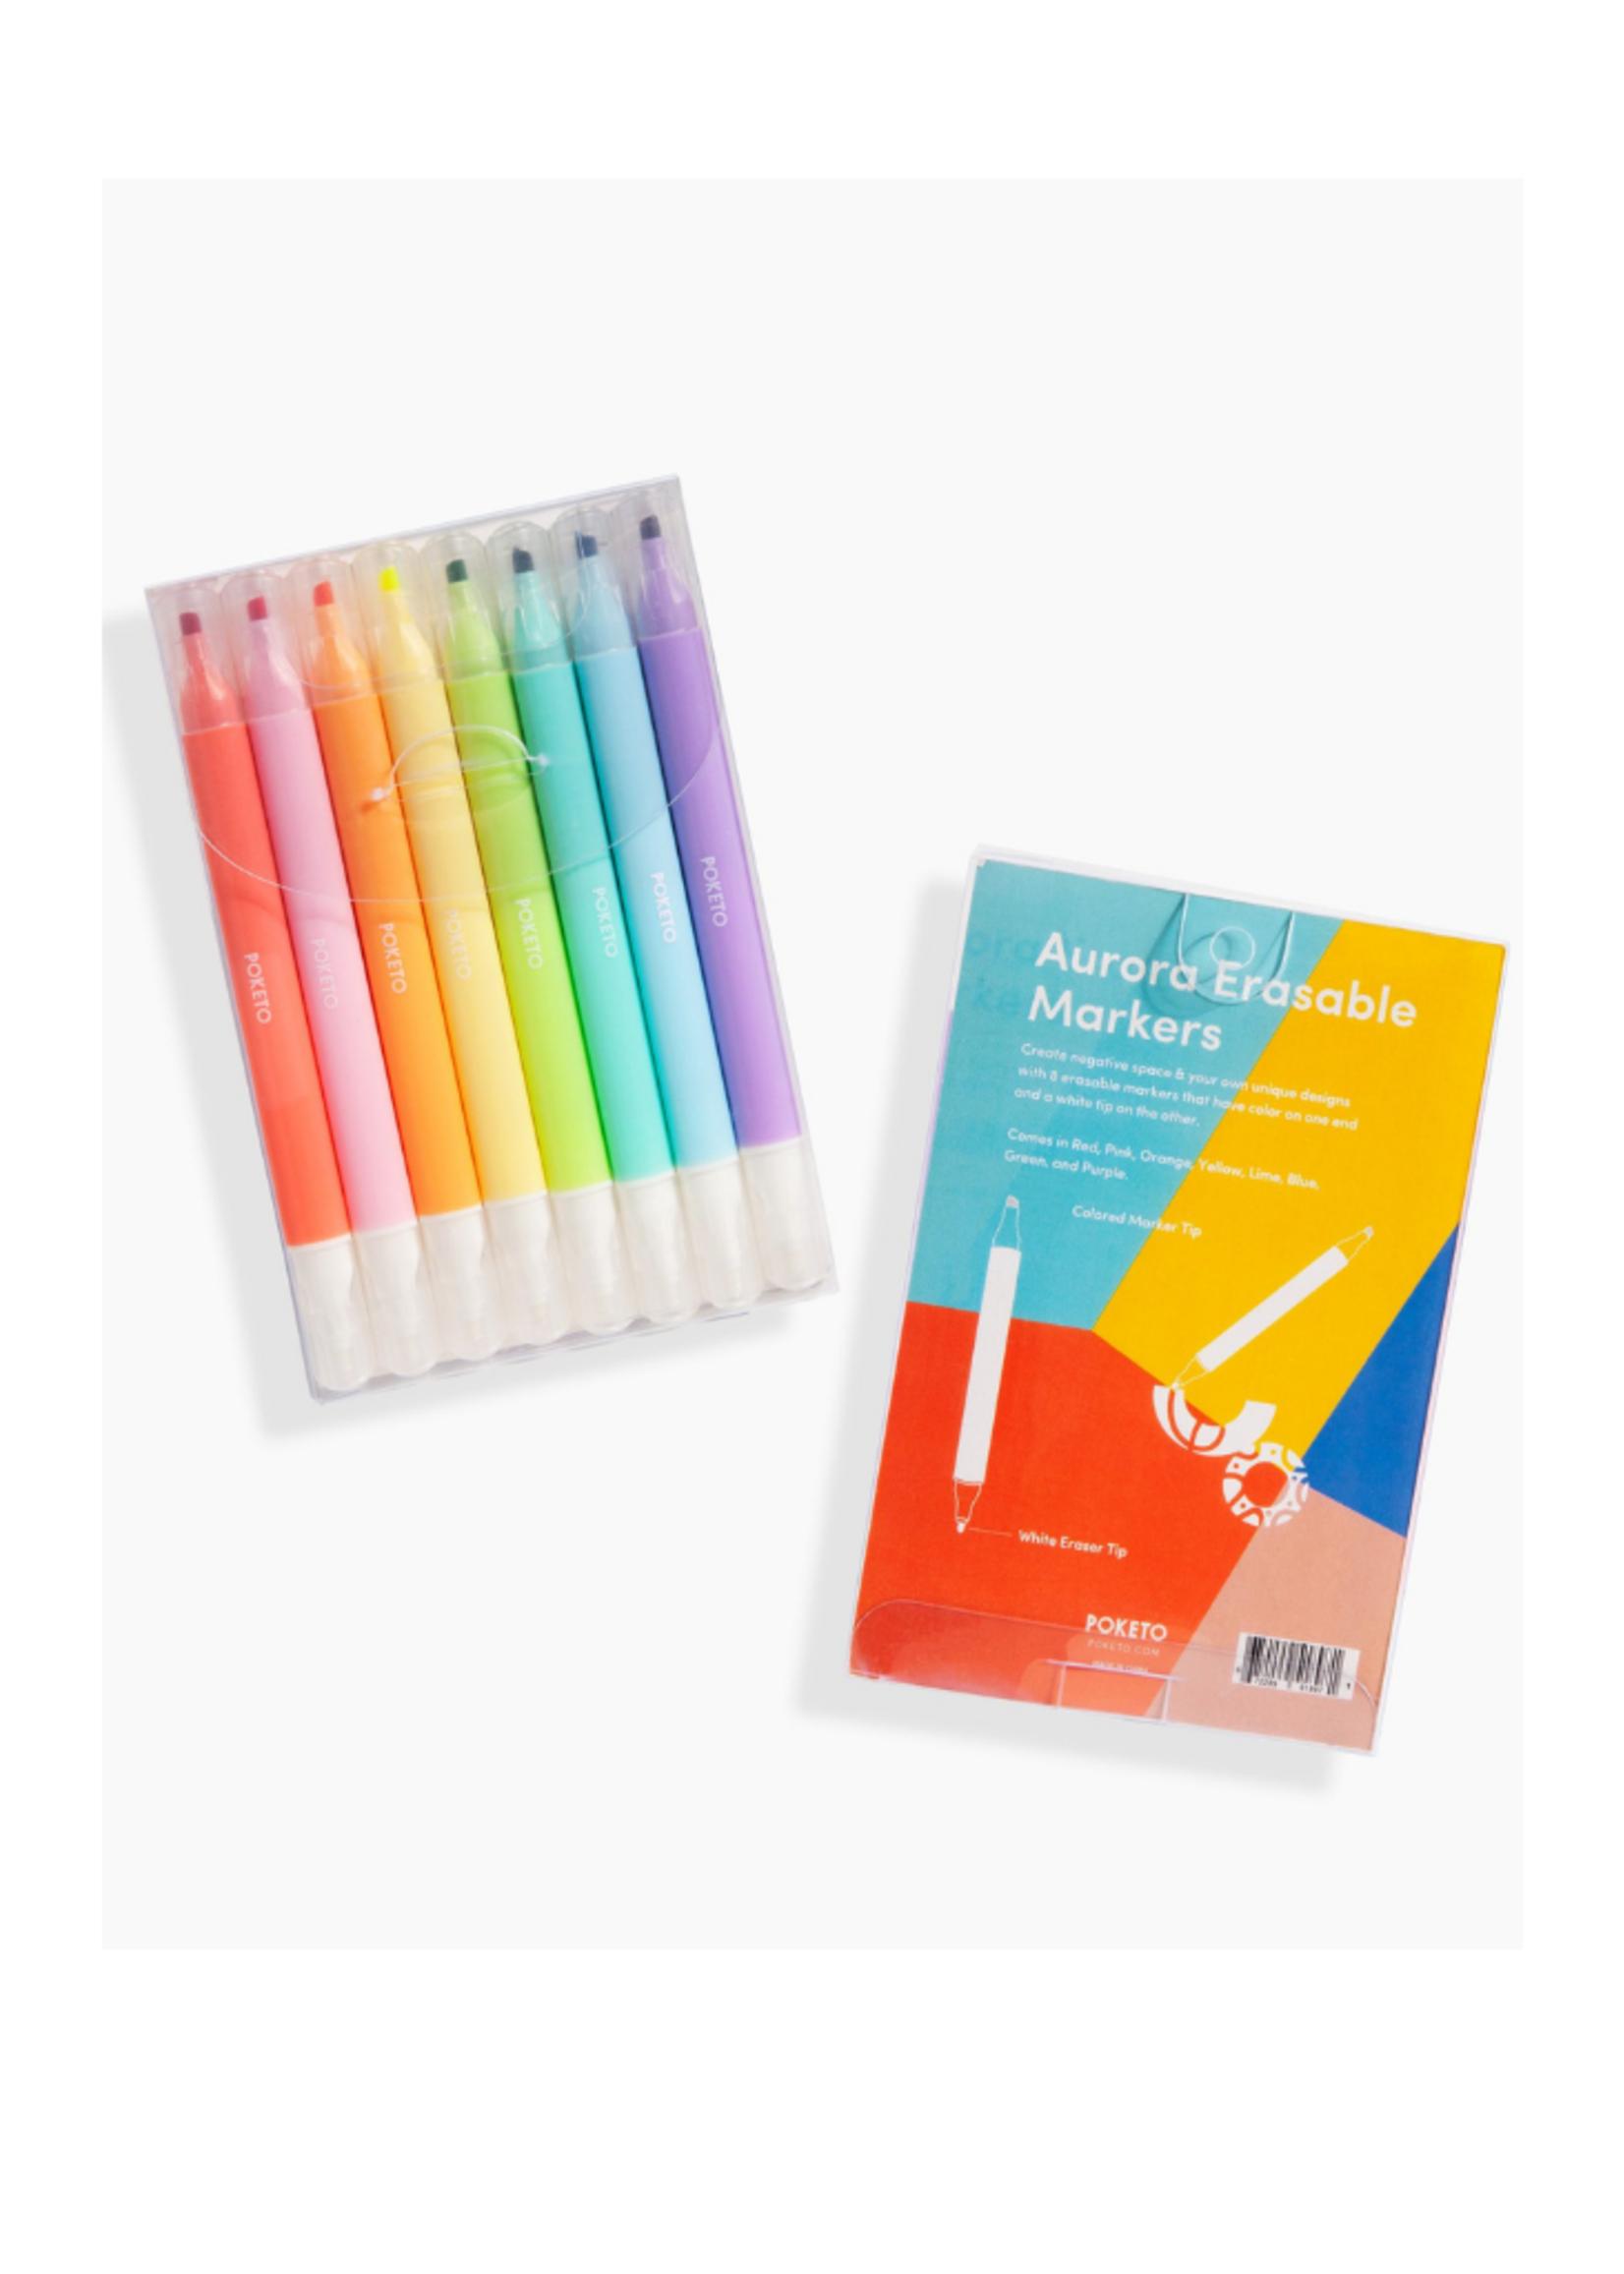 Poketo Aurora Eraseable Markers